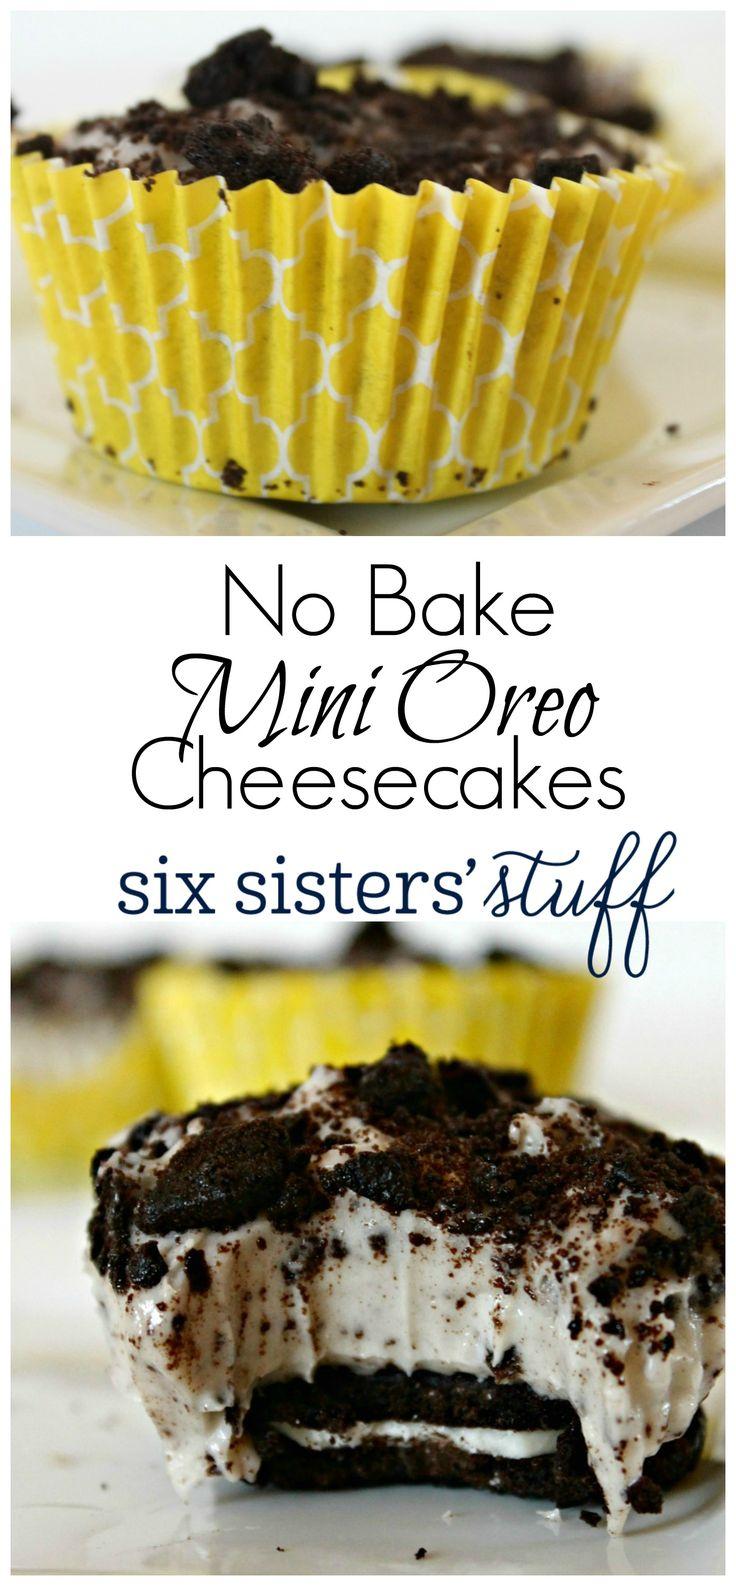 Check Out No Bake Mini Oreo Cheesecakes It S So Easy To